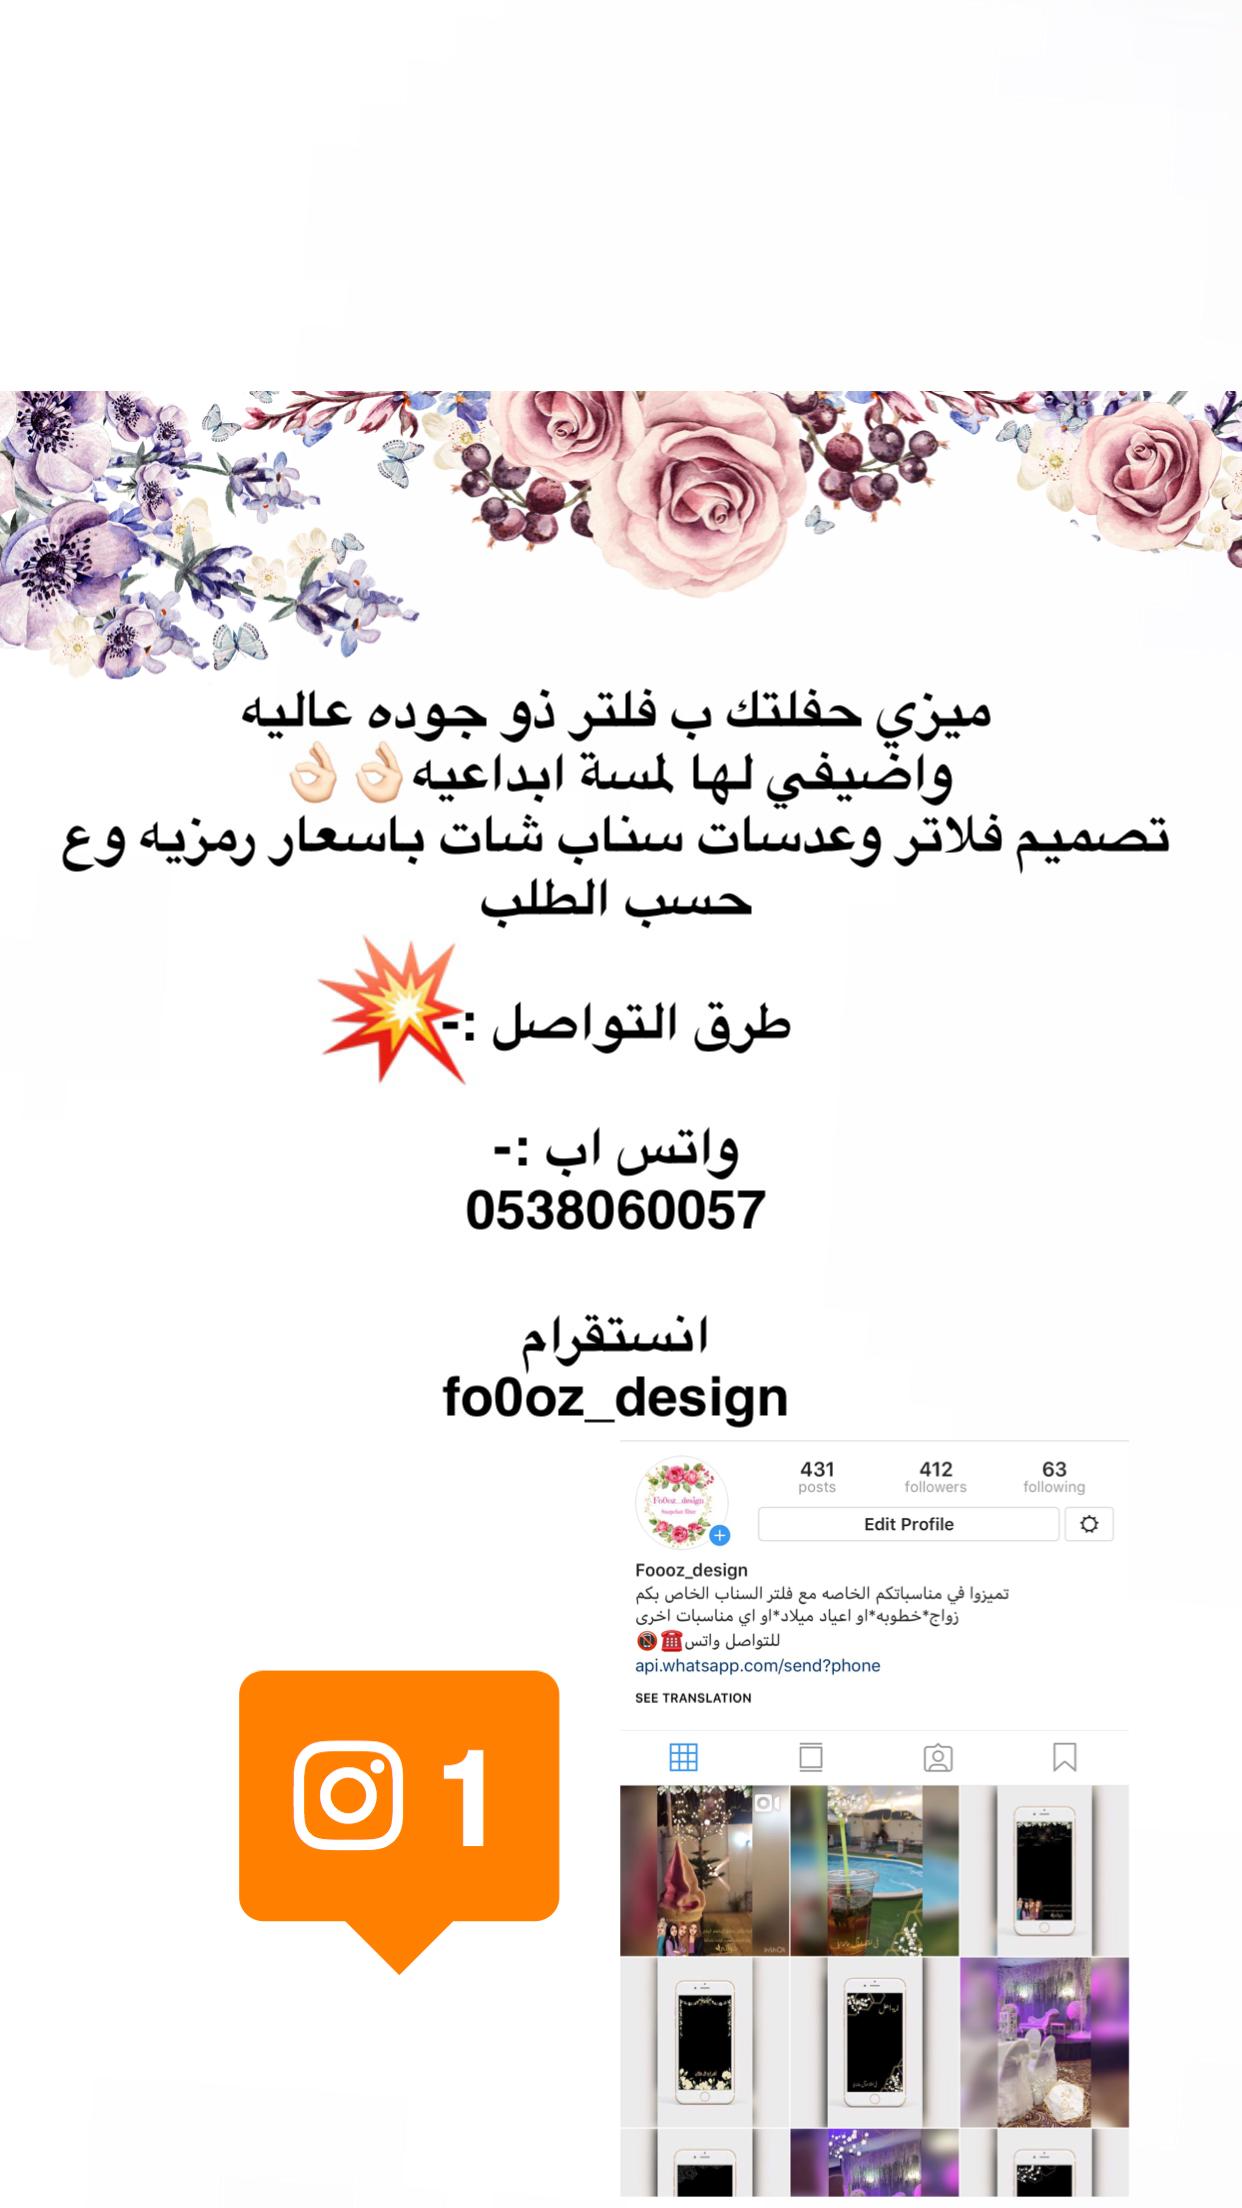 Pin By Hhano On اللهم صل على نبينامحمد Snap Filters Design Gifts